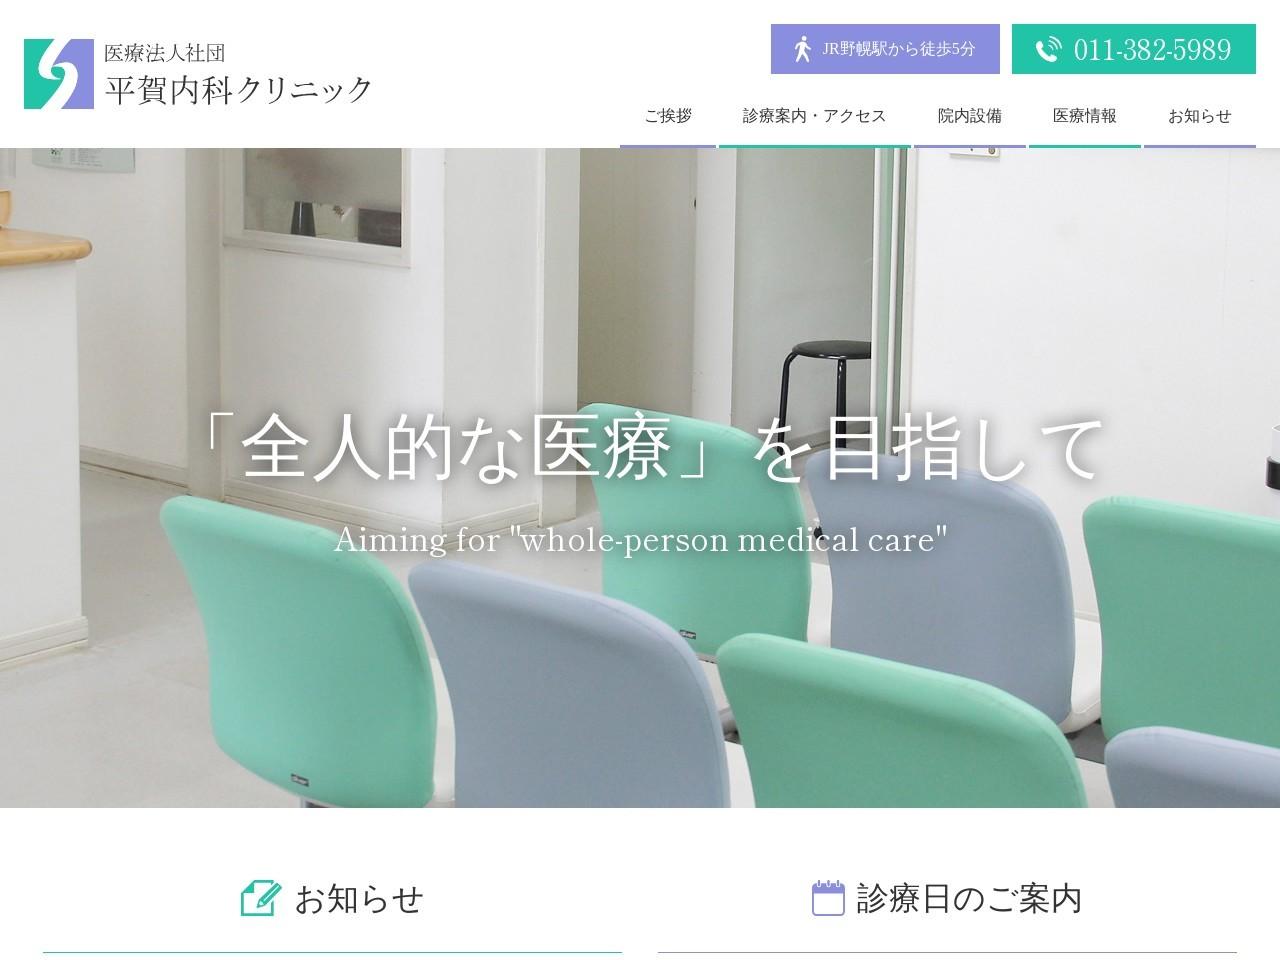 宮の森矯正歯科クリニック (北海道札幌市中央区)